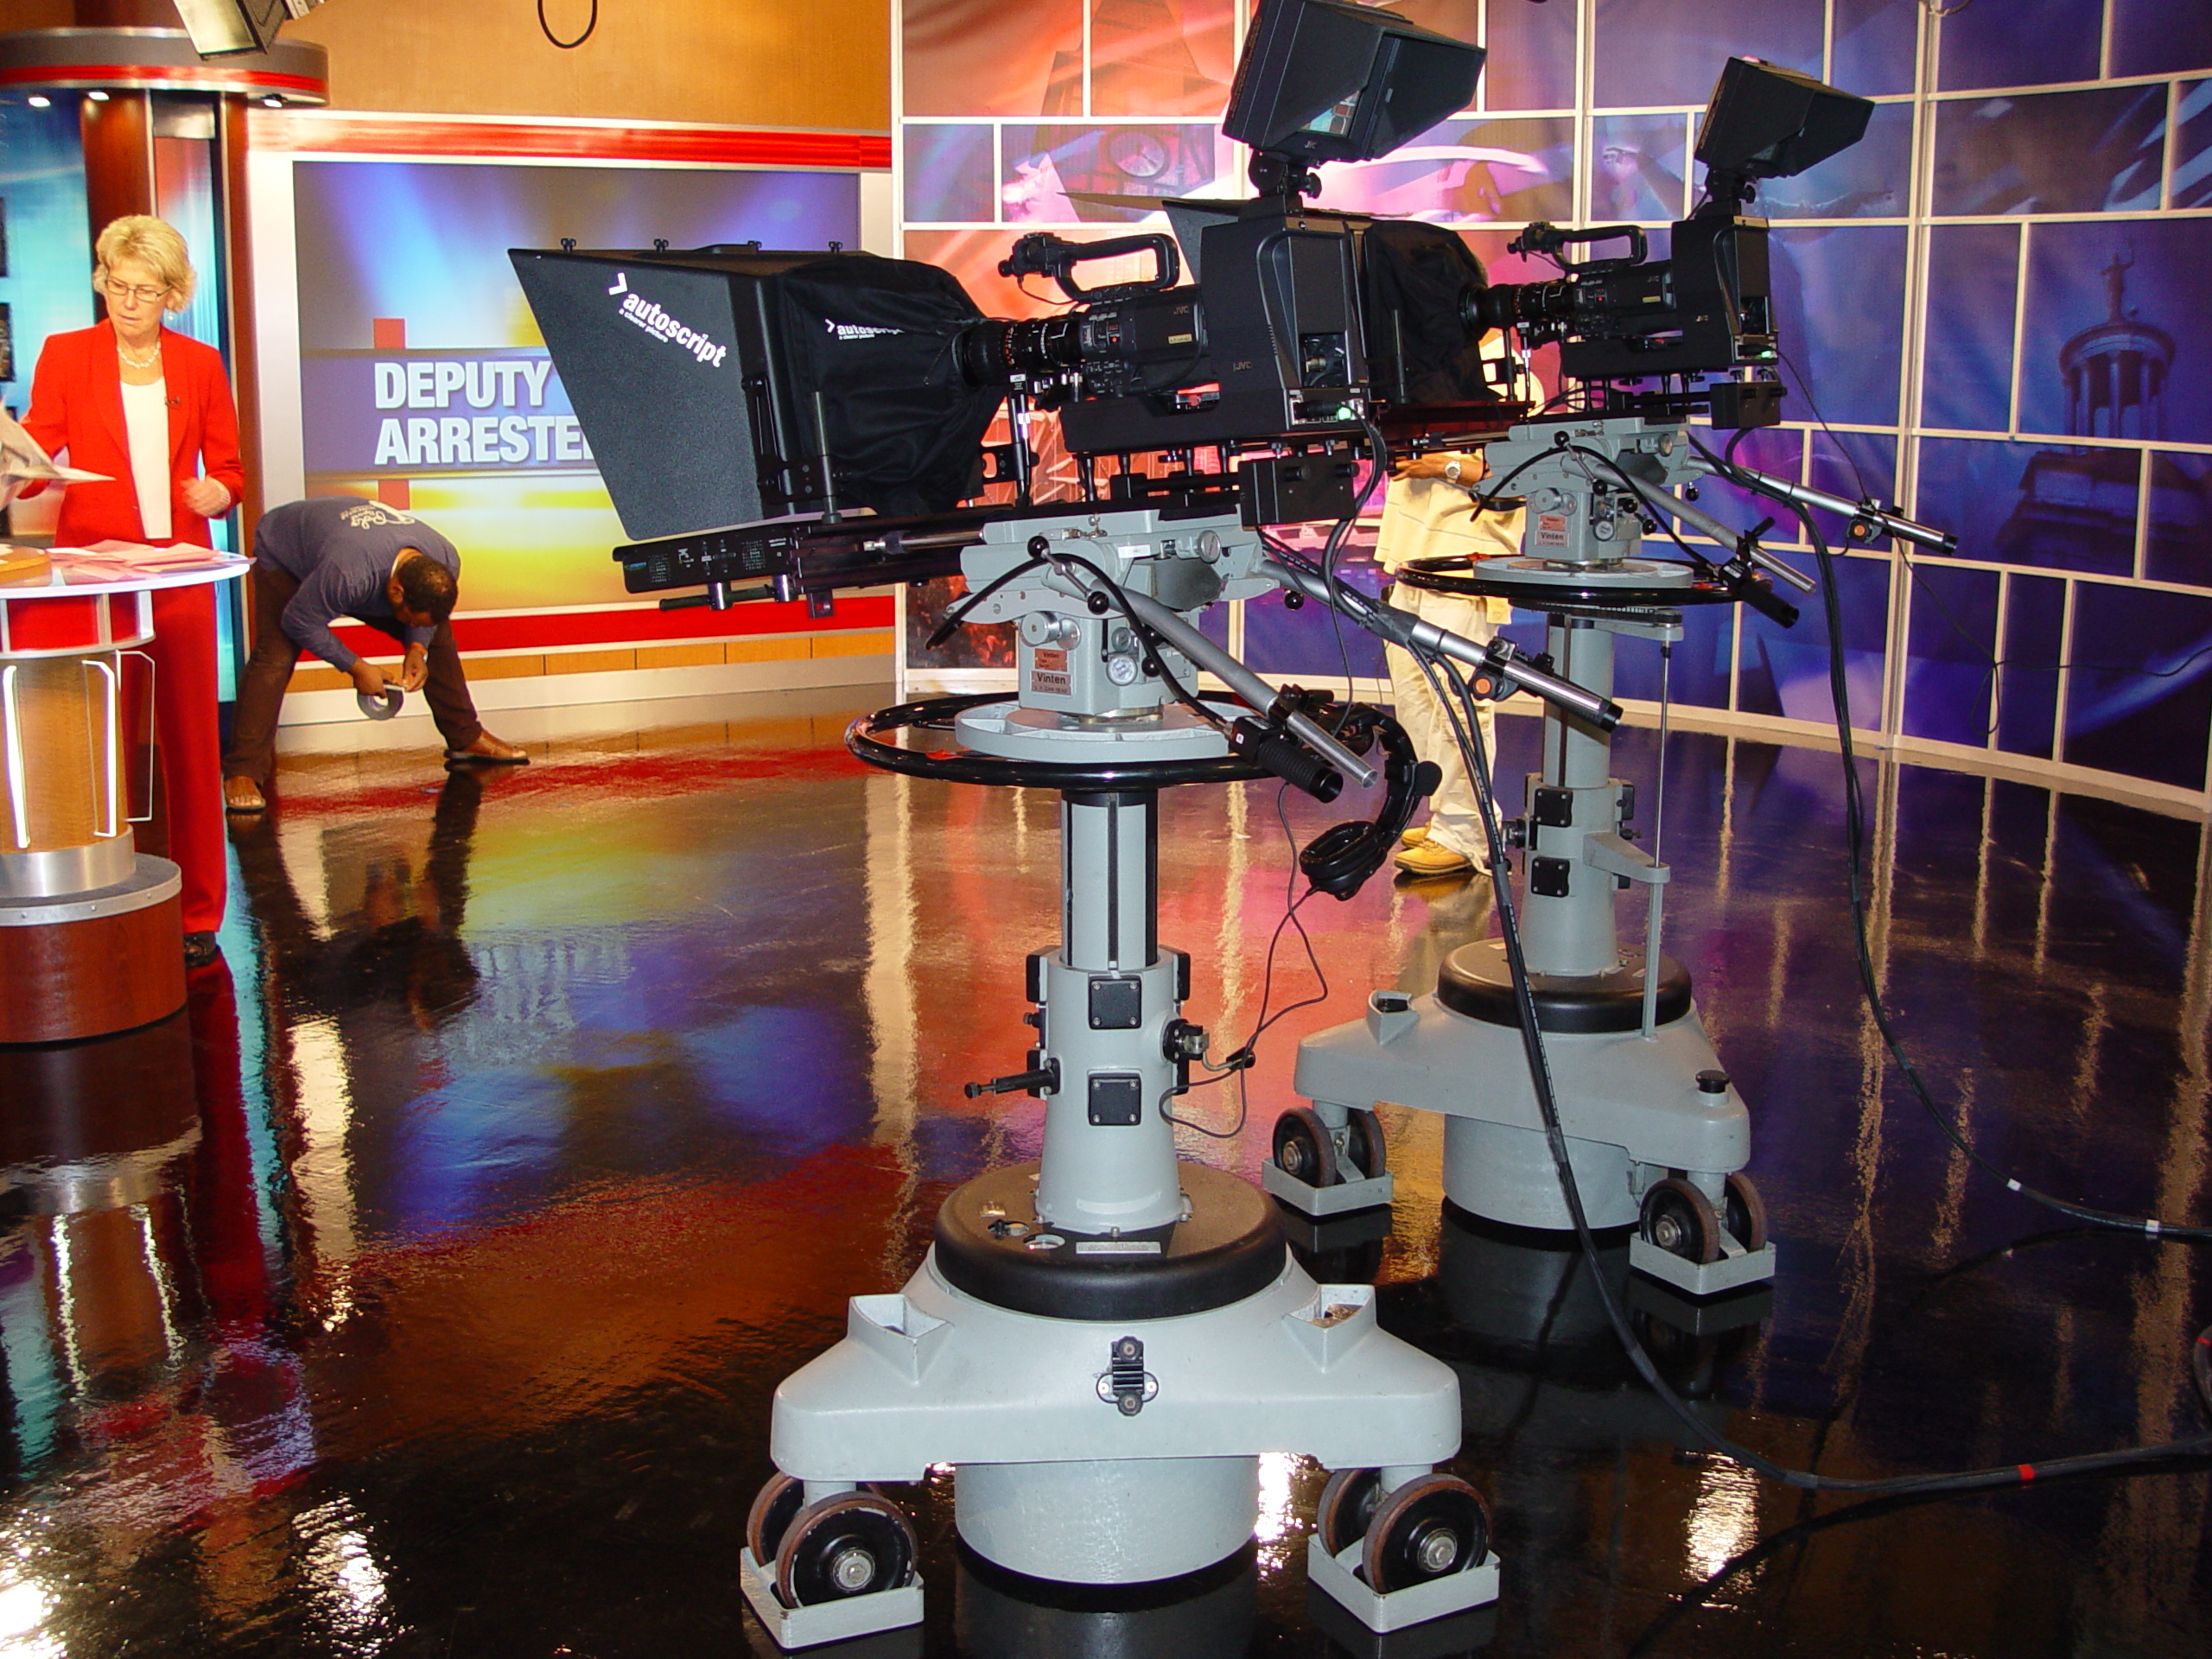 Wkrc cincinnati adopts jvc studio cameras - Tv in camera ...